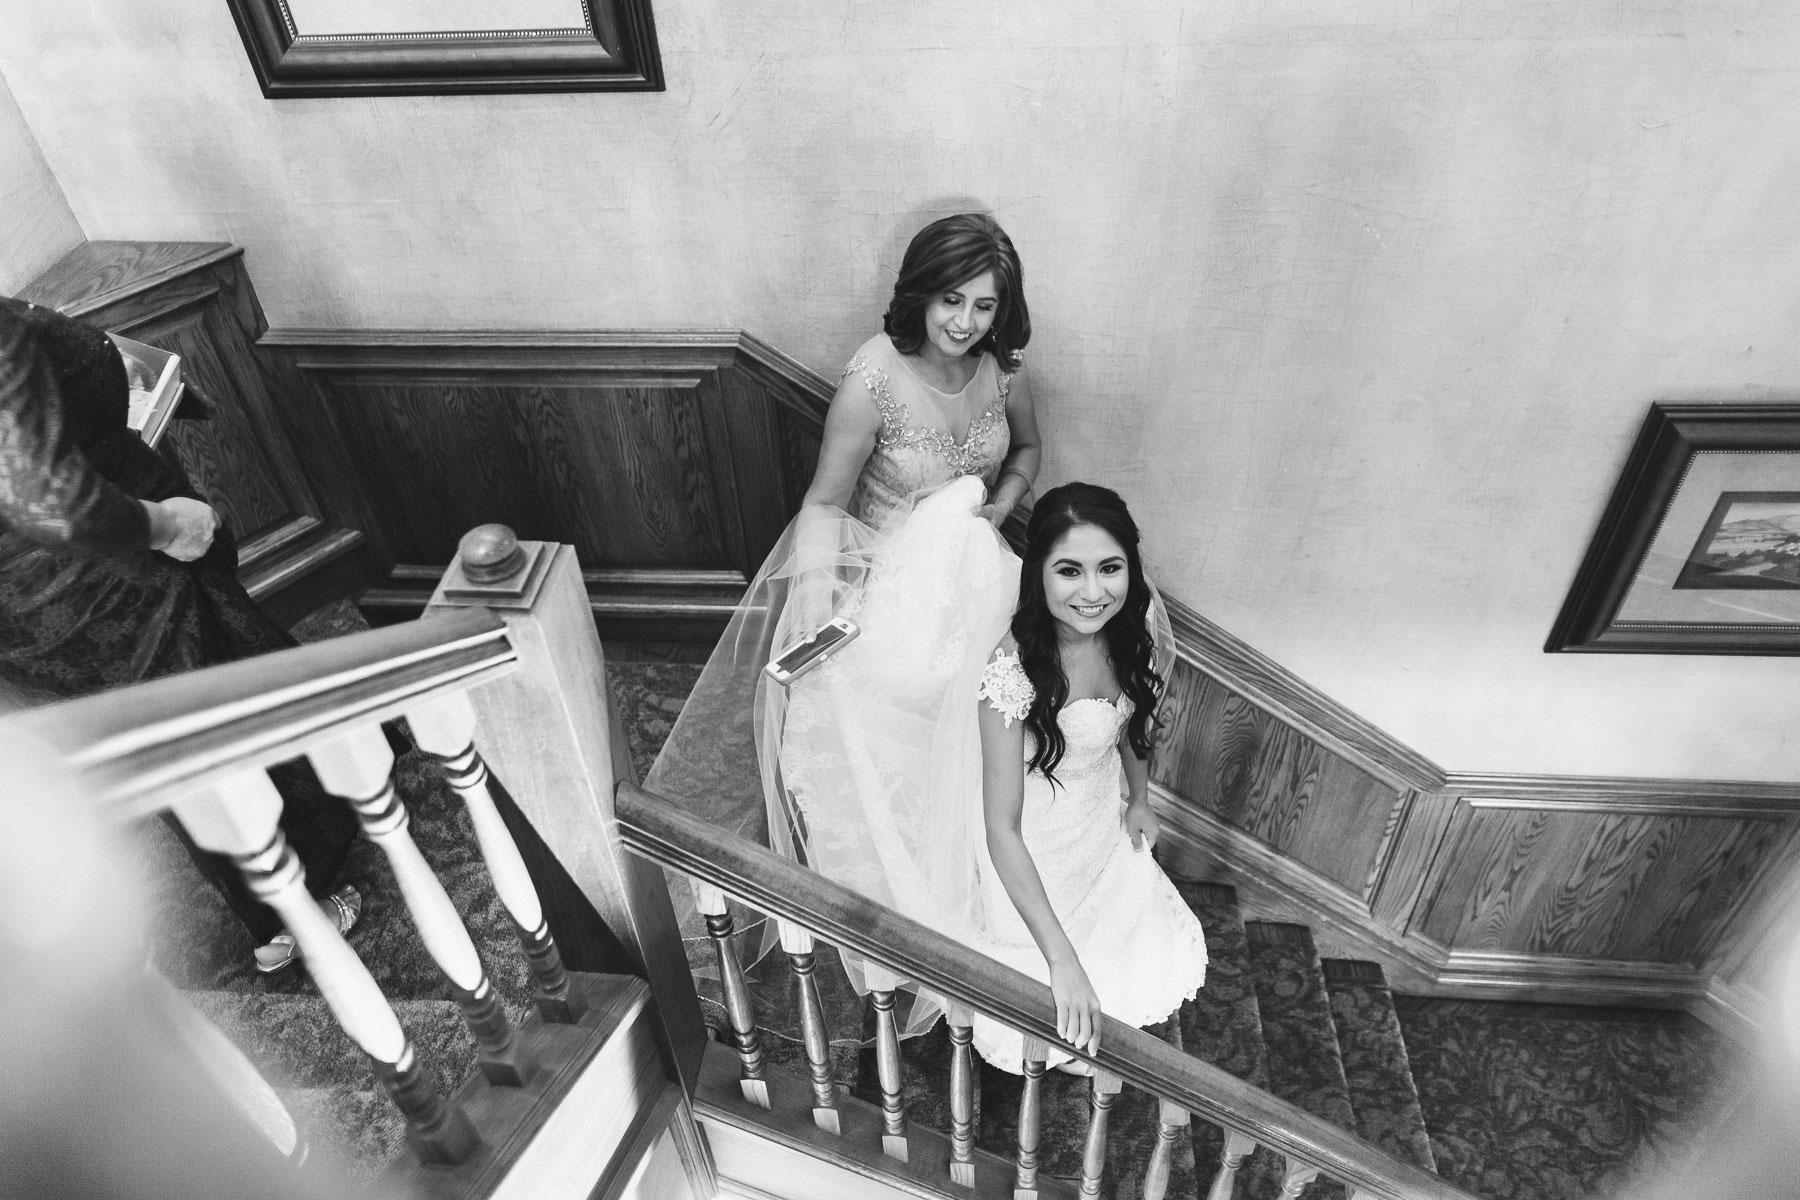 161029-Luxium-Weddings-Arizona-Jeff-Griselda-First-Look-Val-Vista-Lakes-Gilber-027.jpg